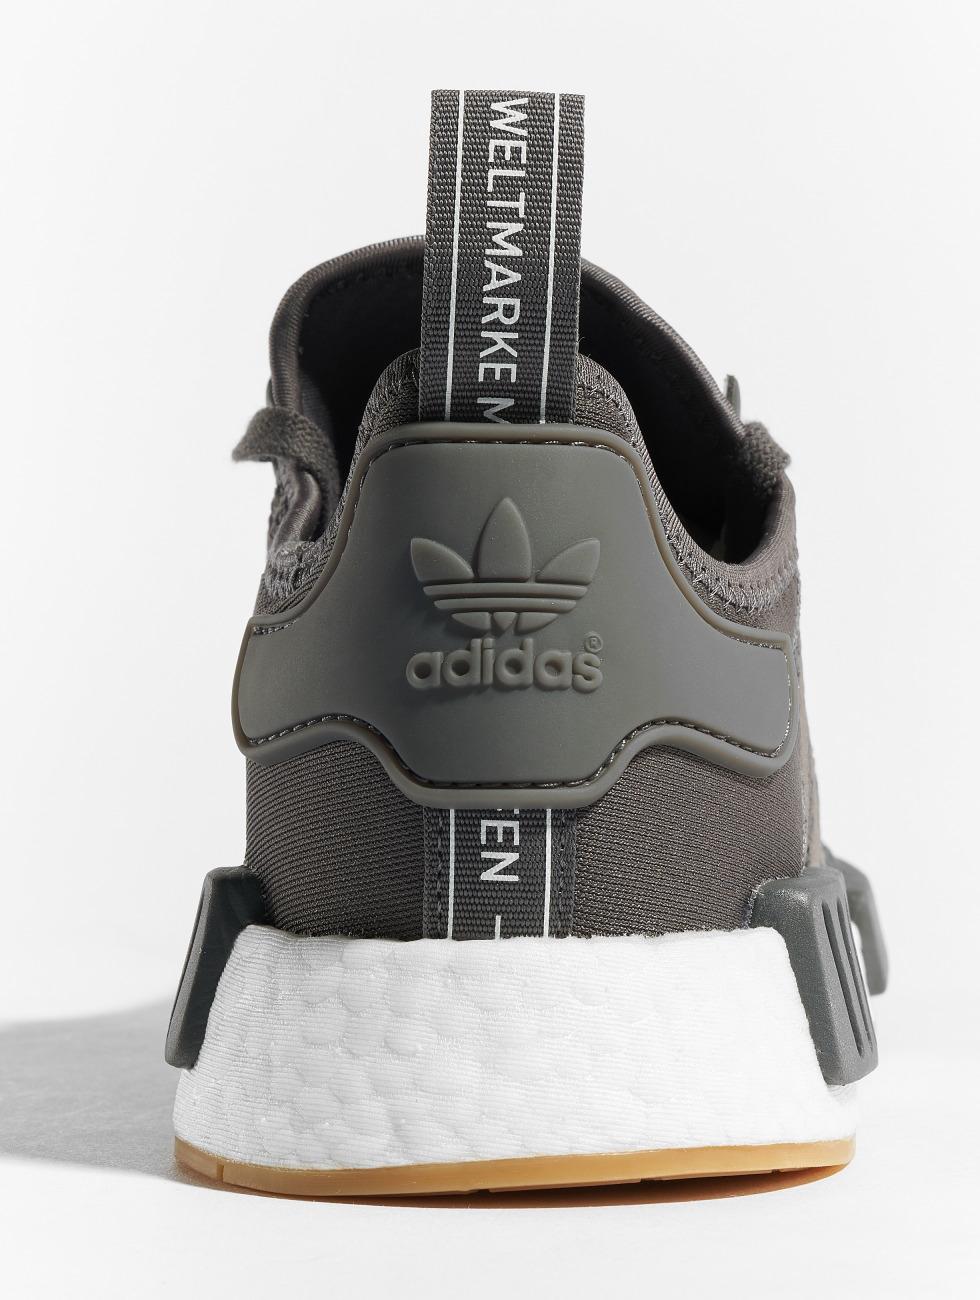 adidas originals Sneakers Nmd_r1 gray